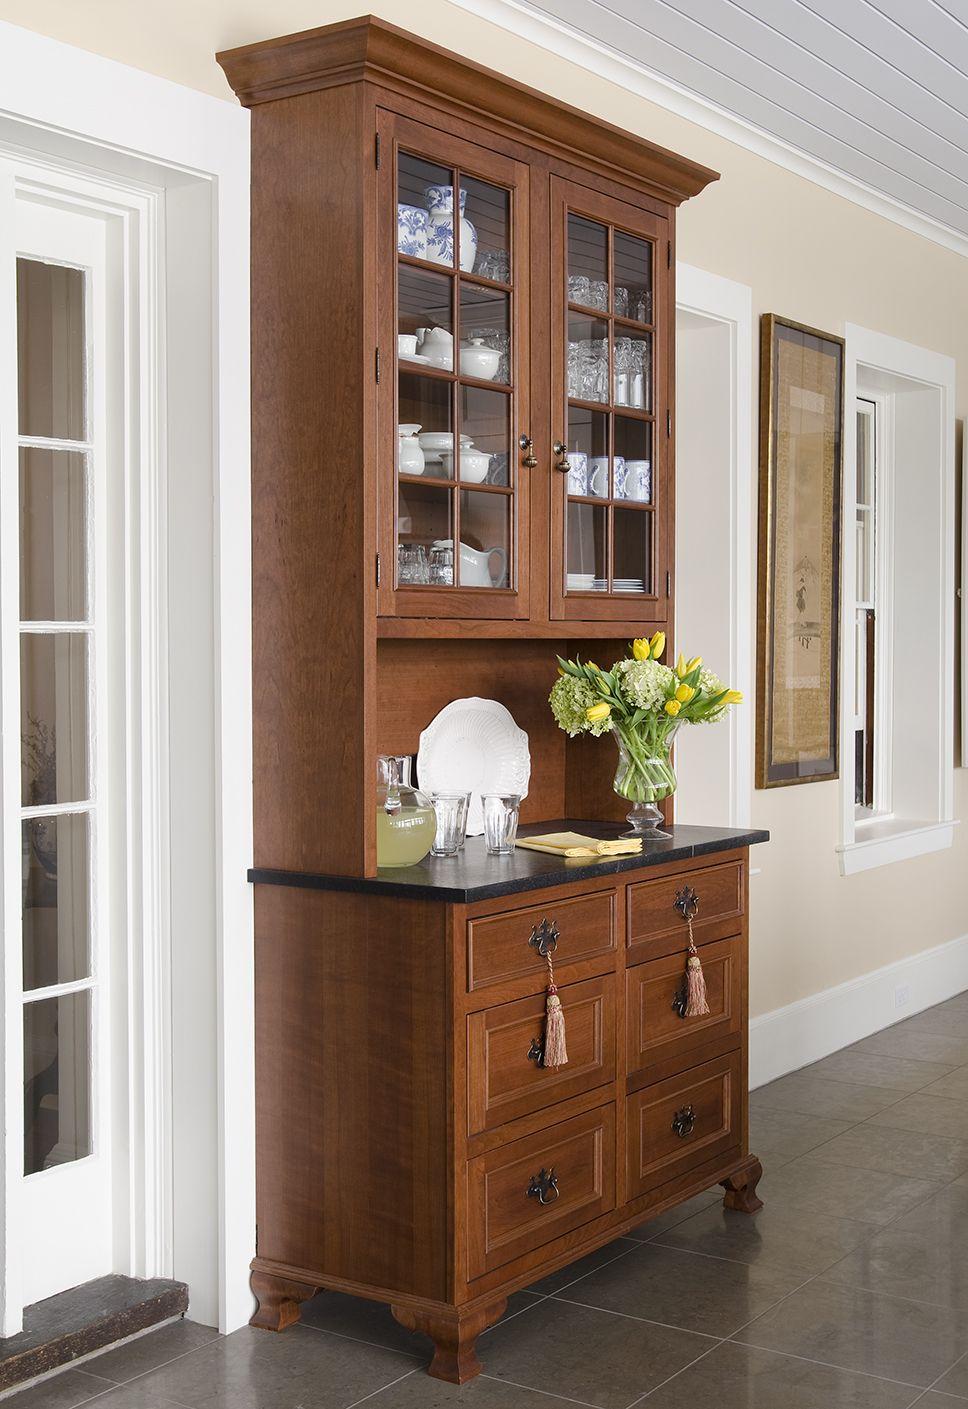 kitchen cove cabinets photo credit james r salomon kitchen design remodel cabinet on r kitchen cabinets id=95899